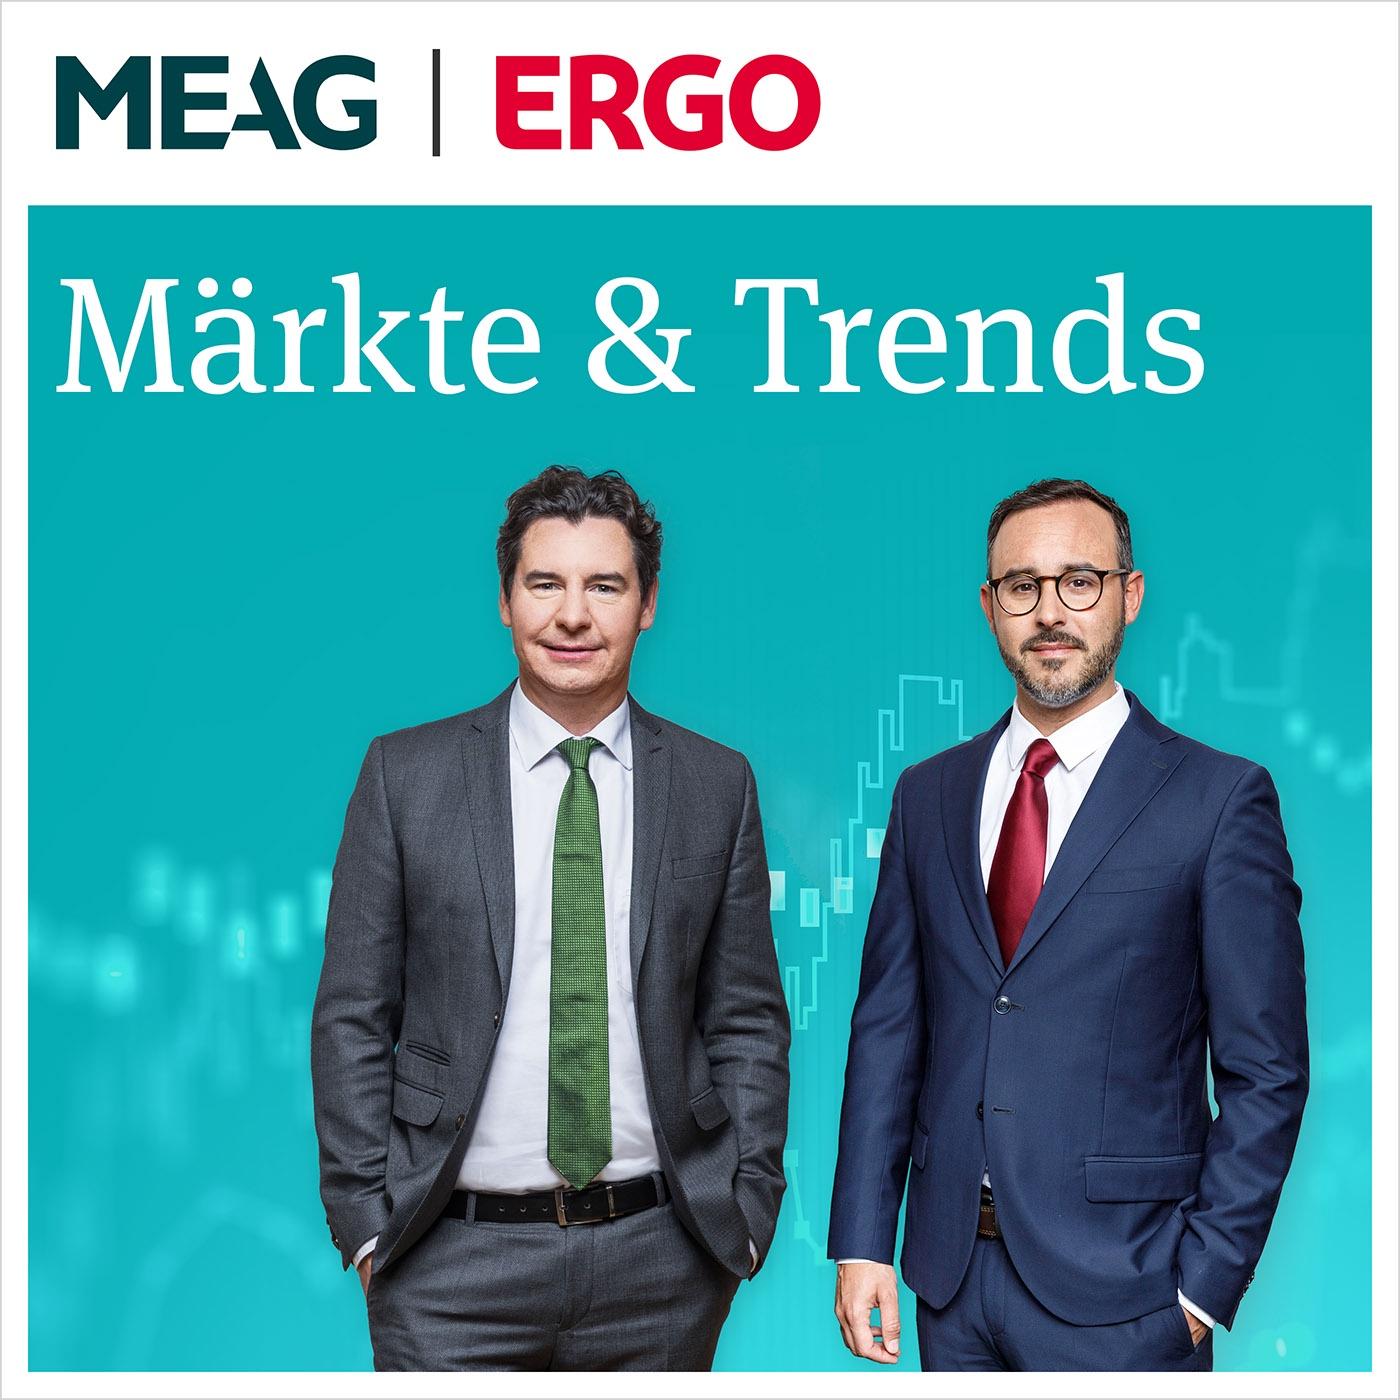 Halbjahresbilanz: Hält der Höhenflug am Kapitalmarkt an?